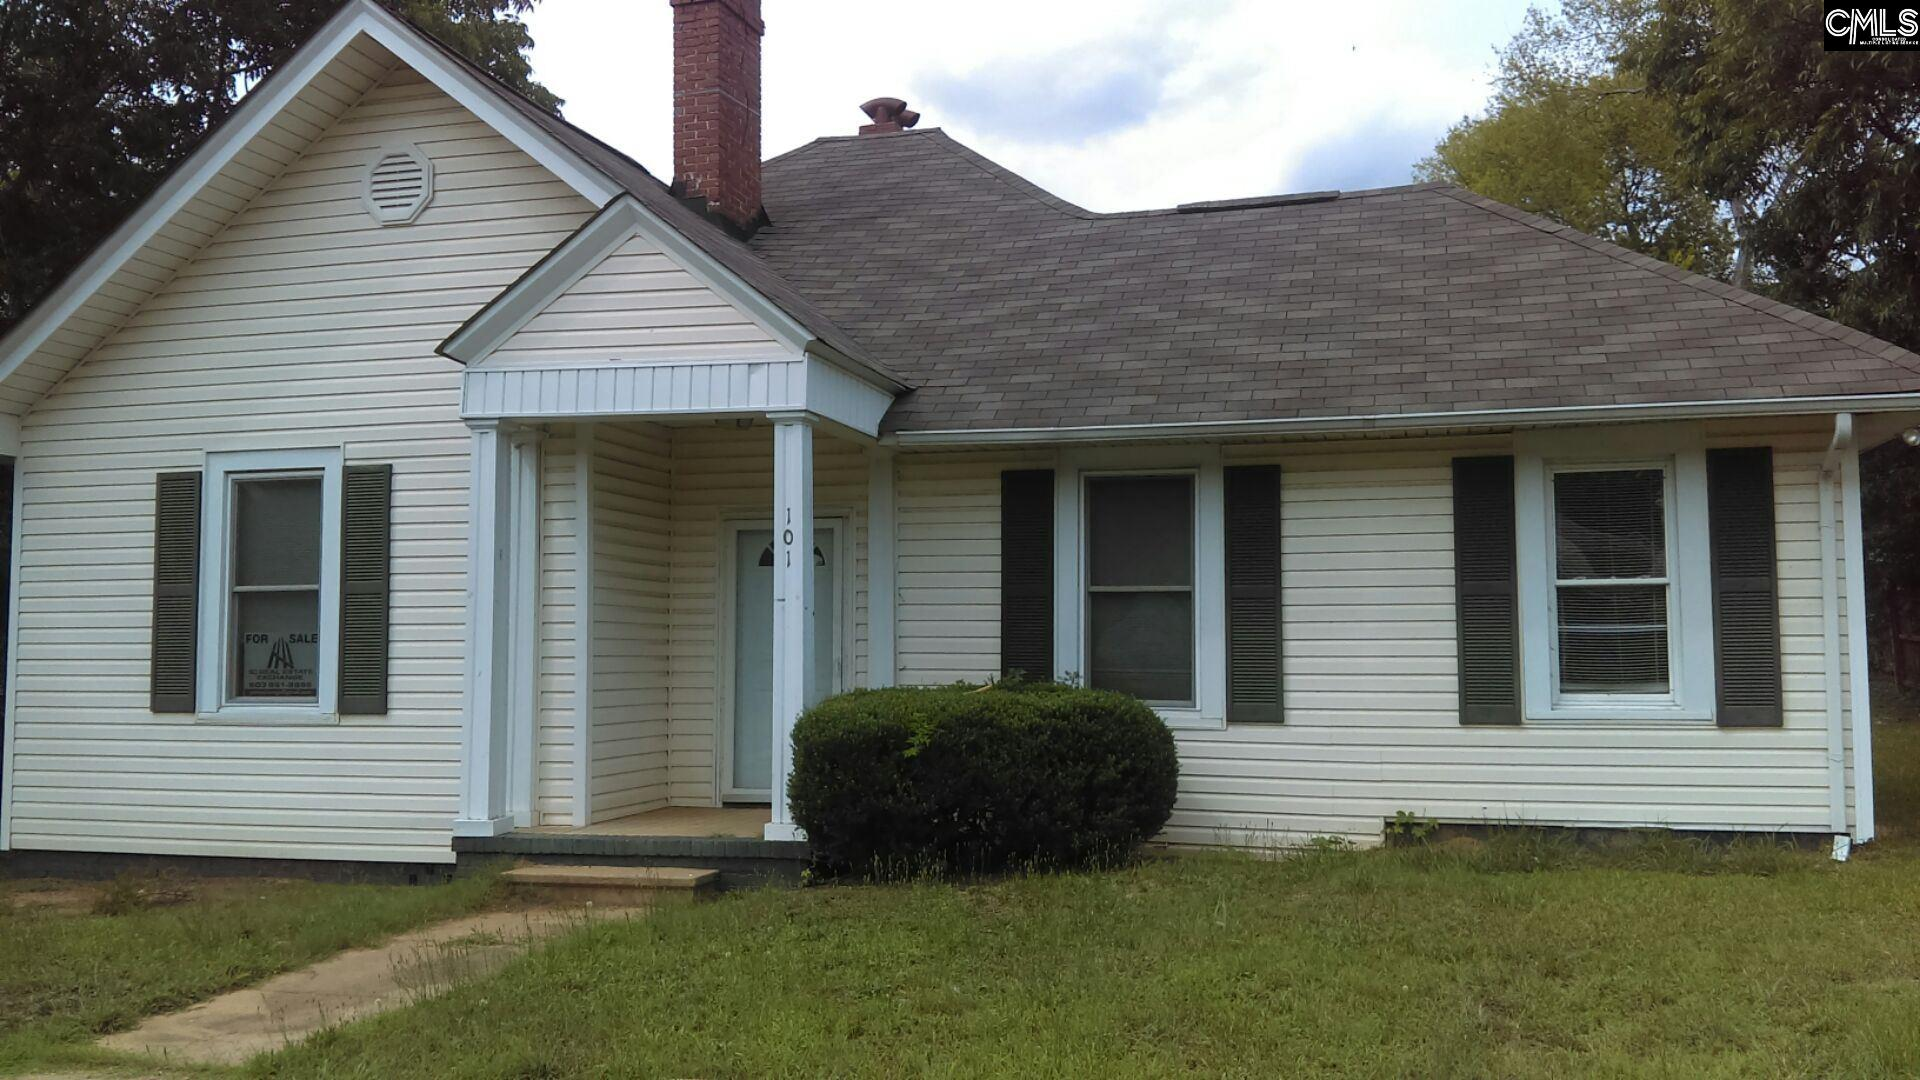 101 N Willow Winnsboro, SC 29180